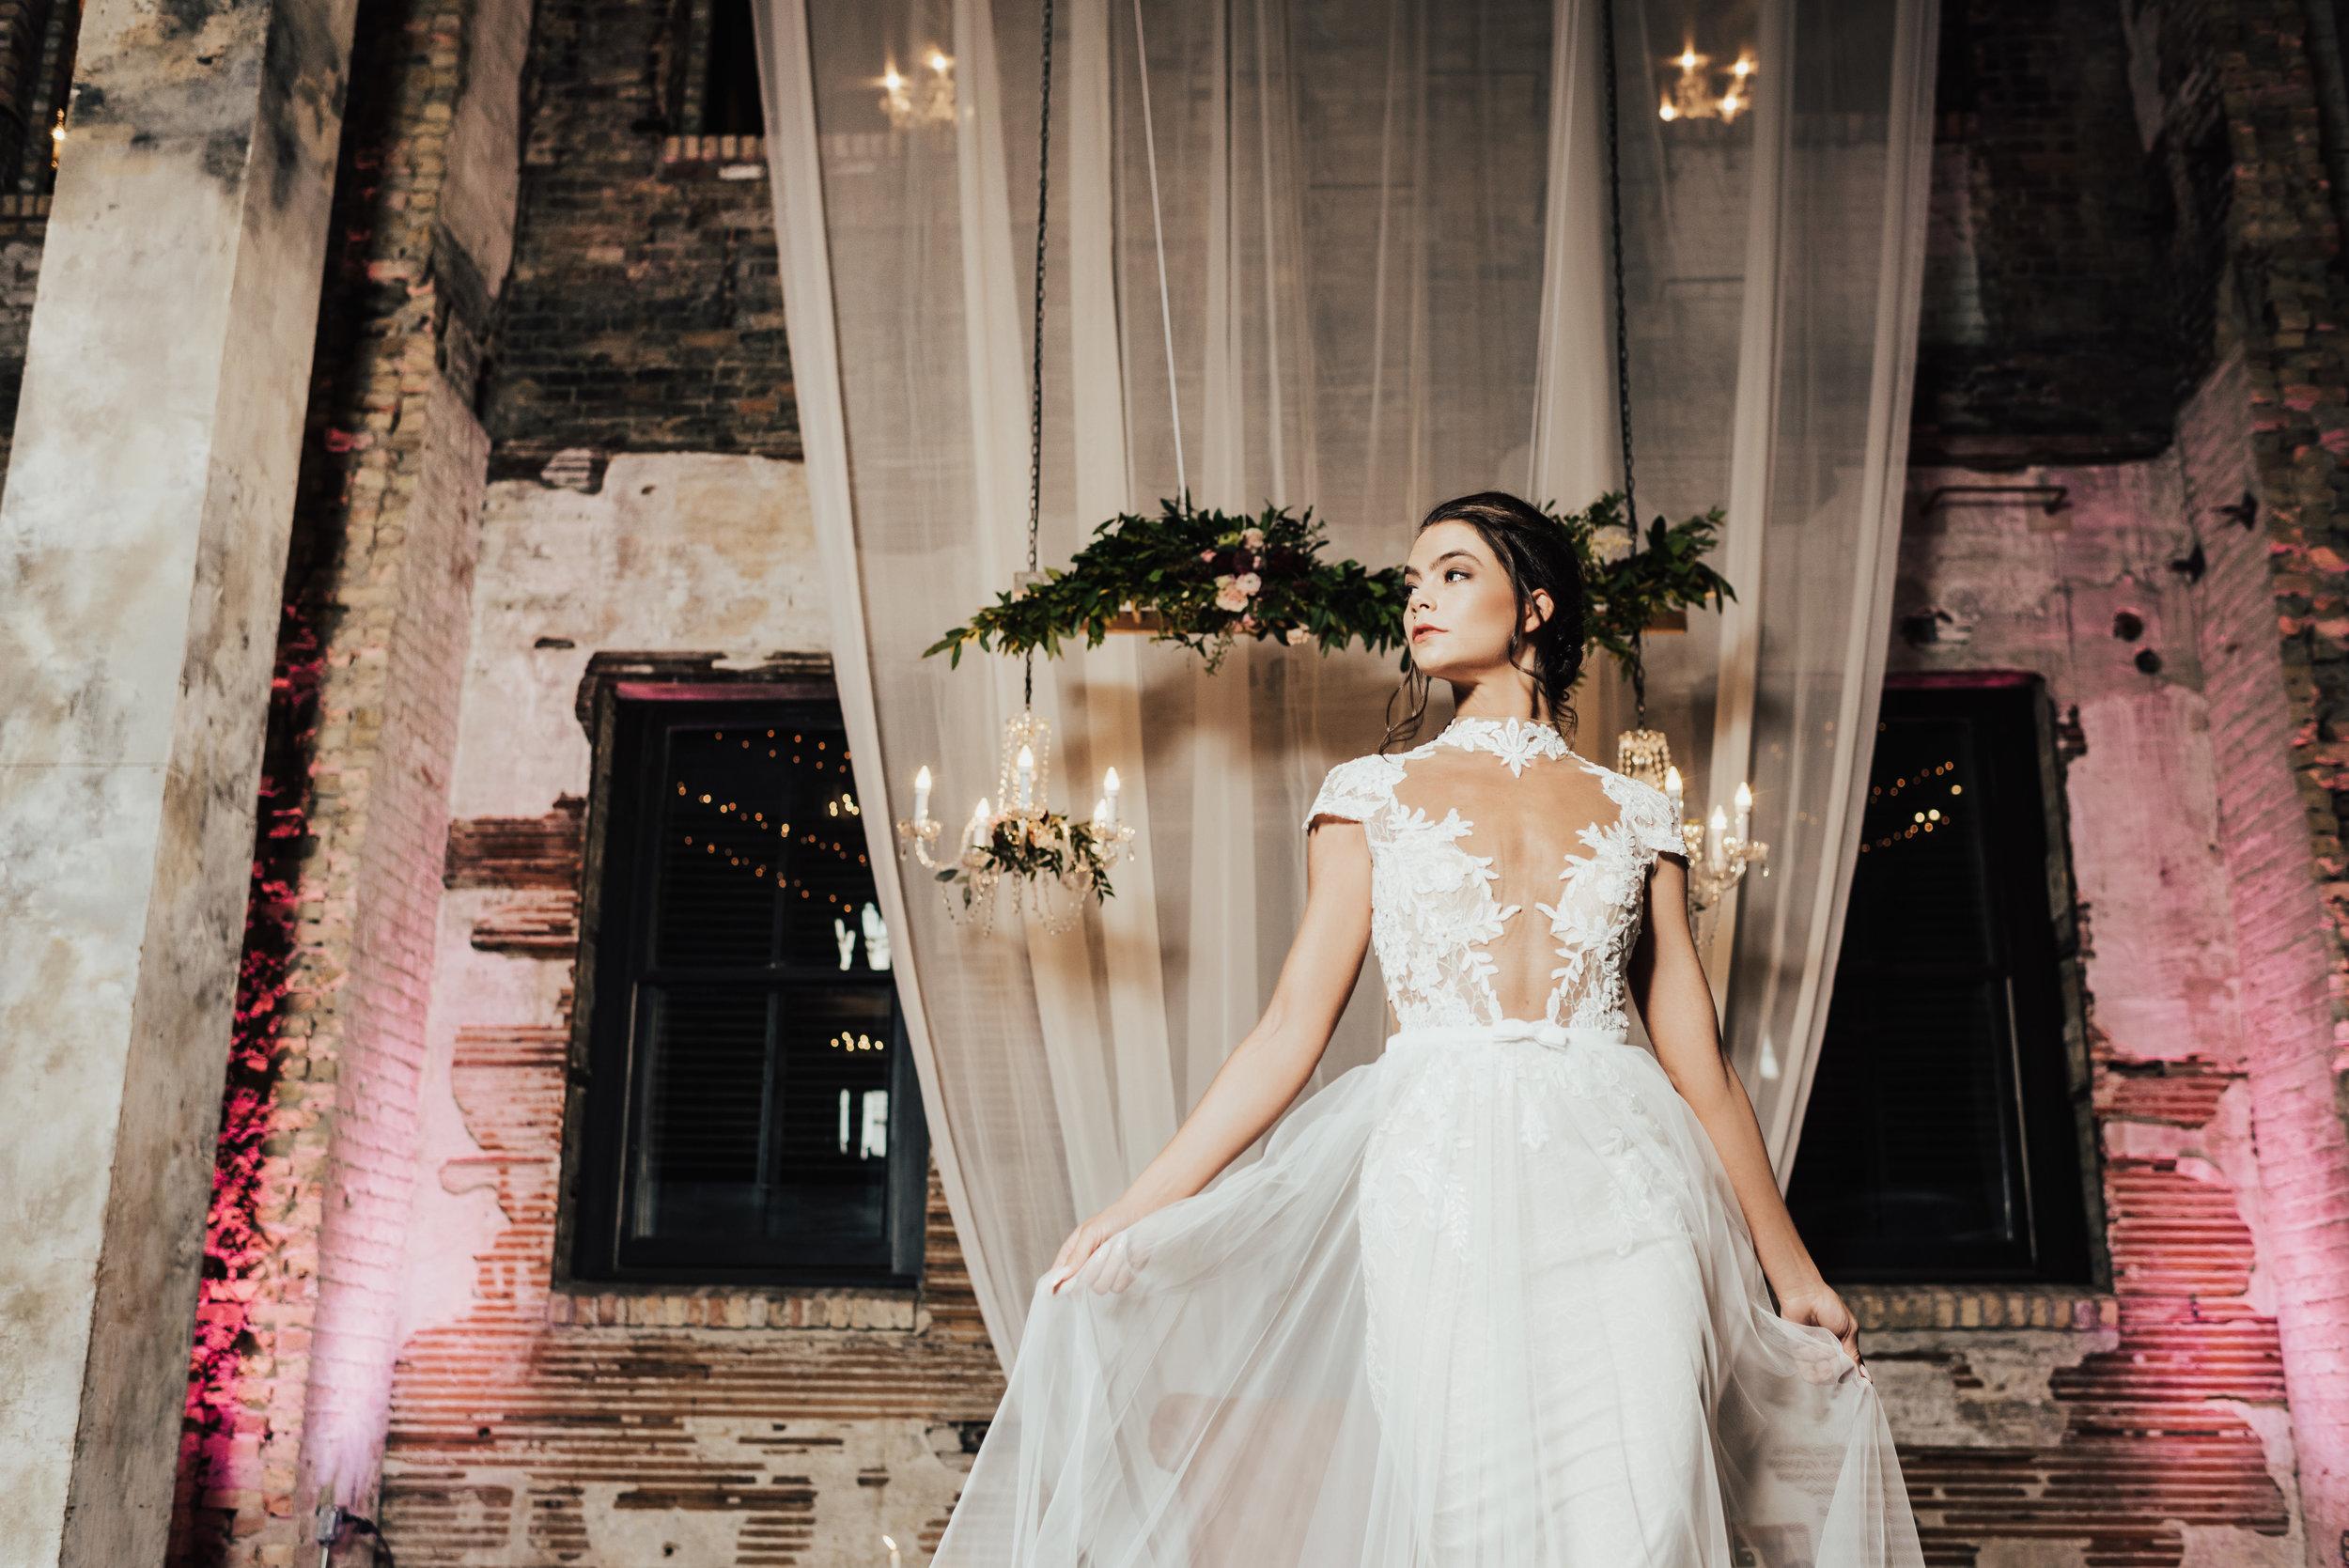 Aria-Wedding-Minneapolis-Steena-Anne-Photography45.jpg